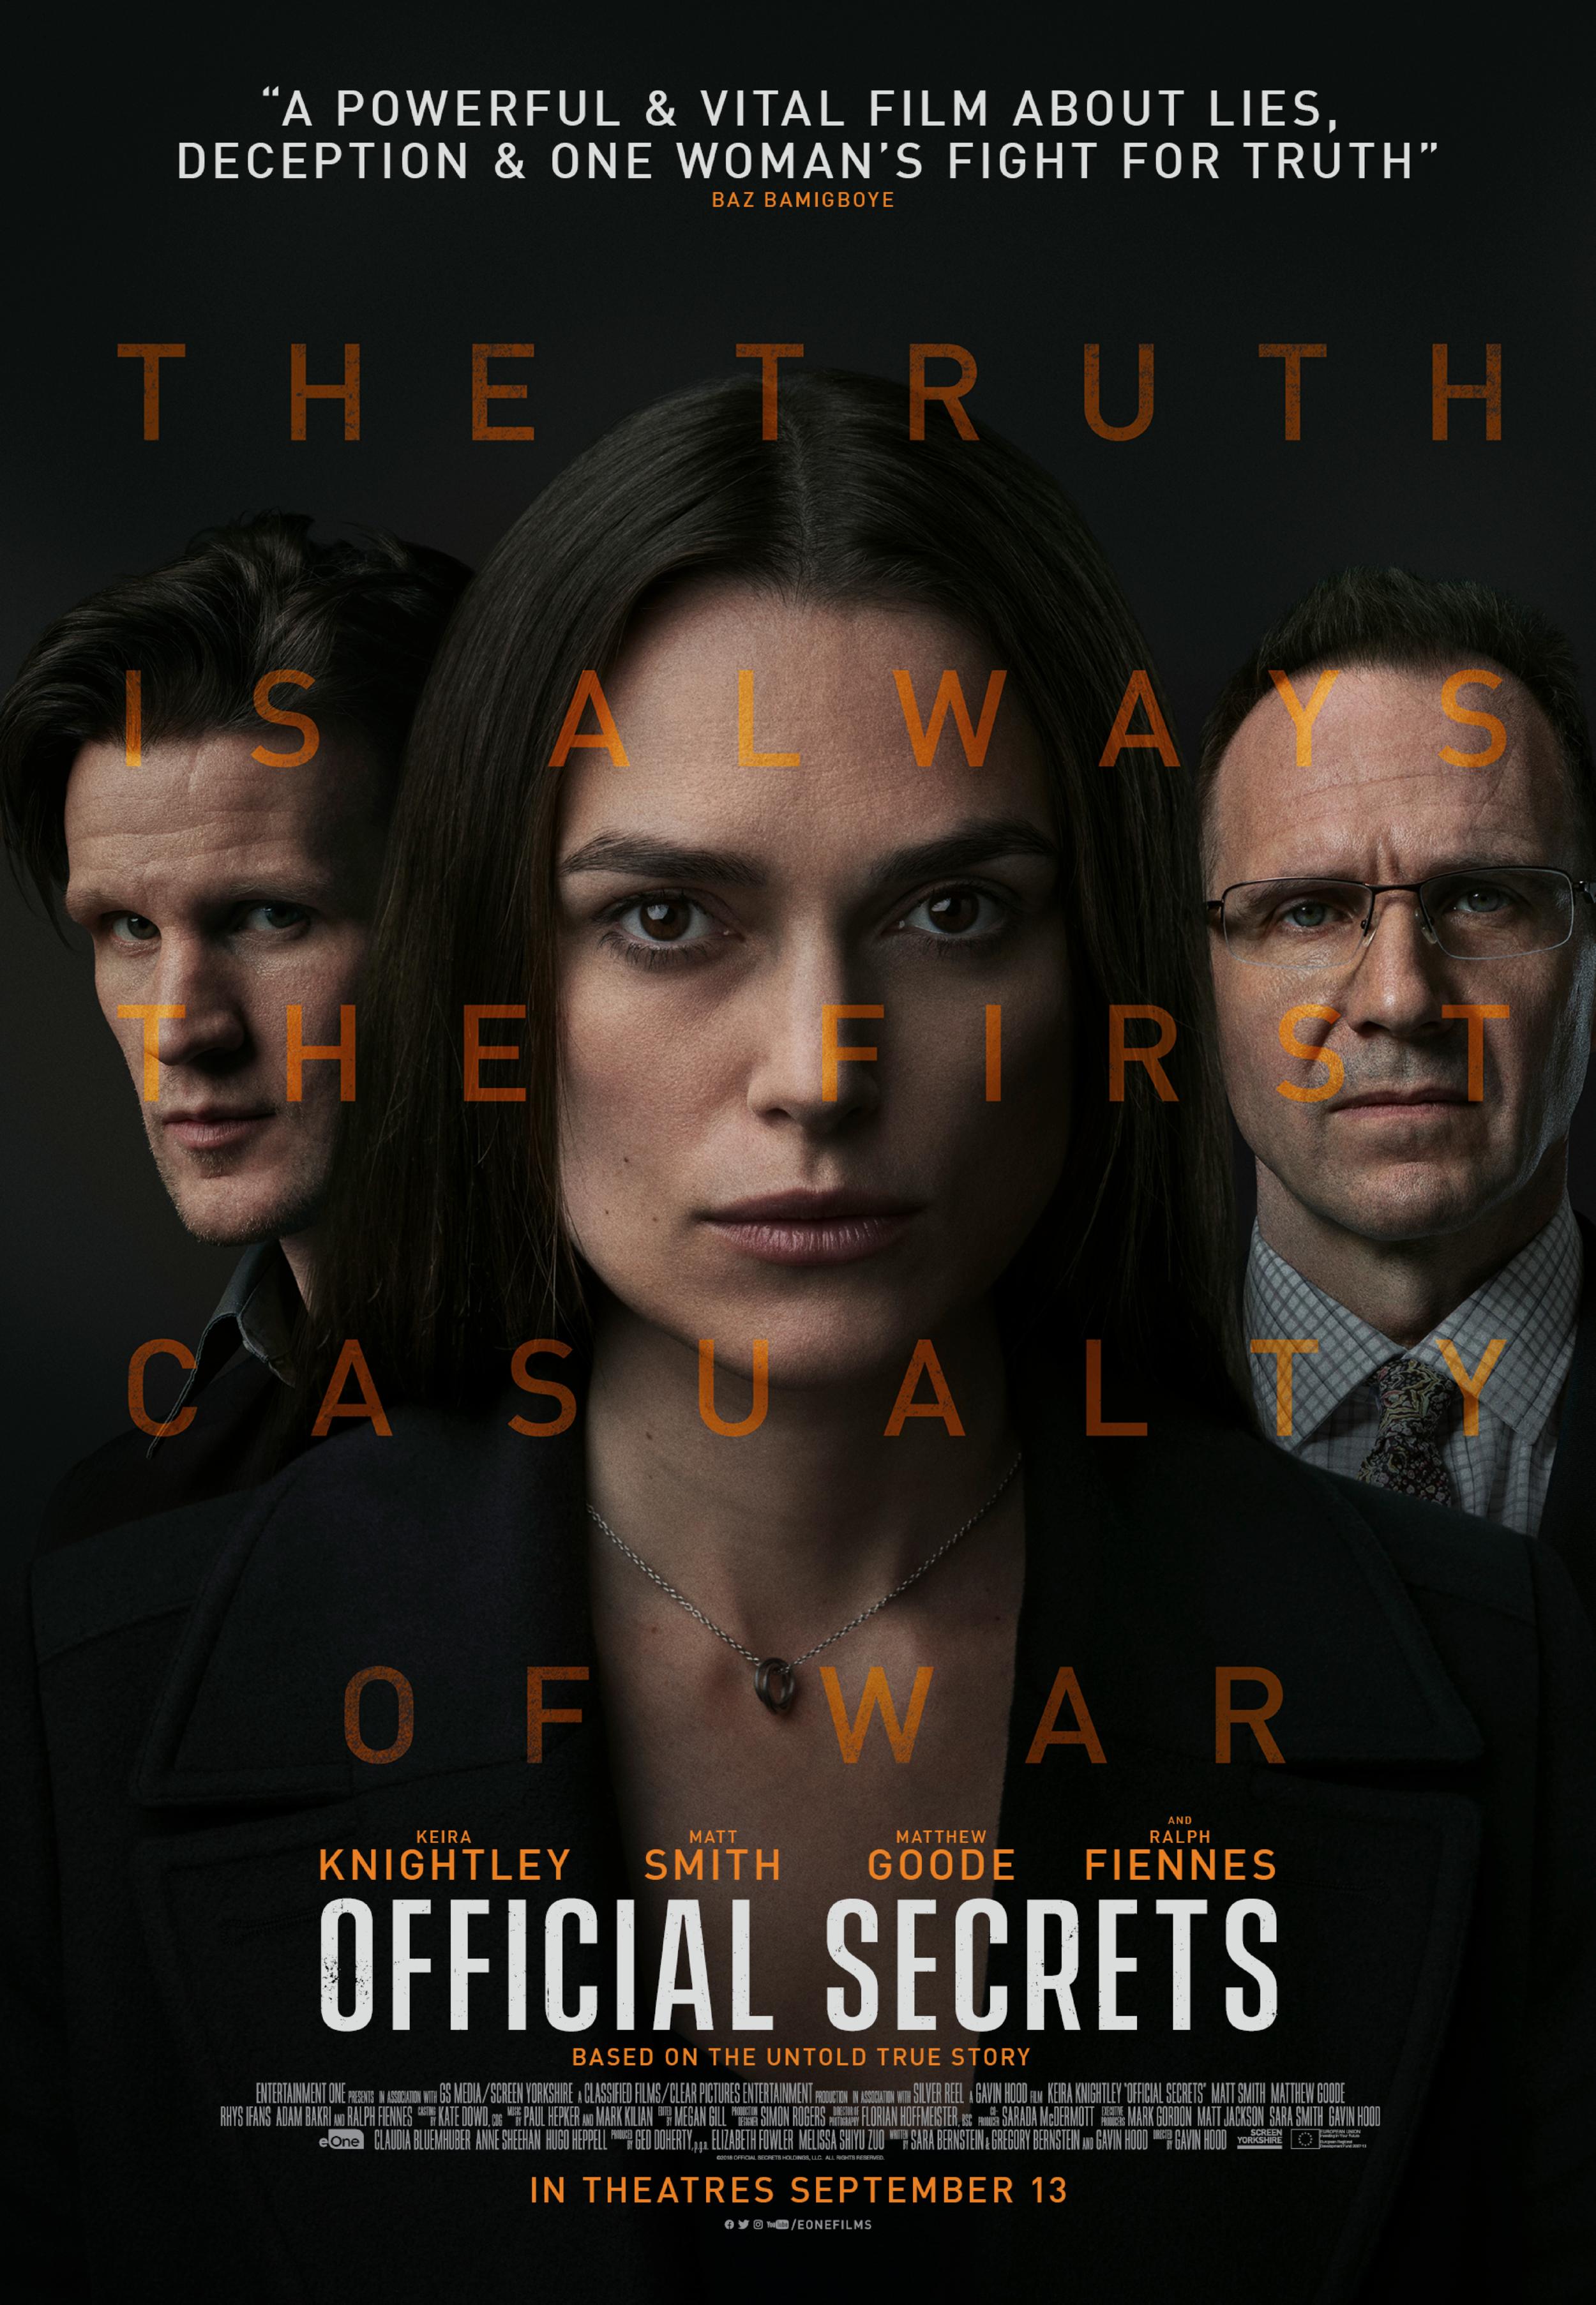 OfficialSecrets_poster_pdf.png